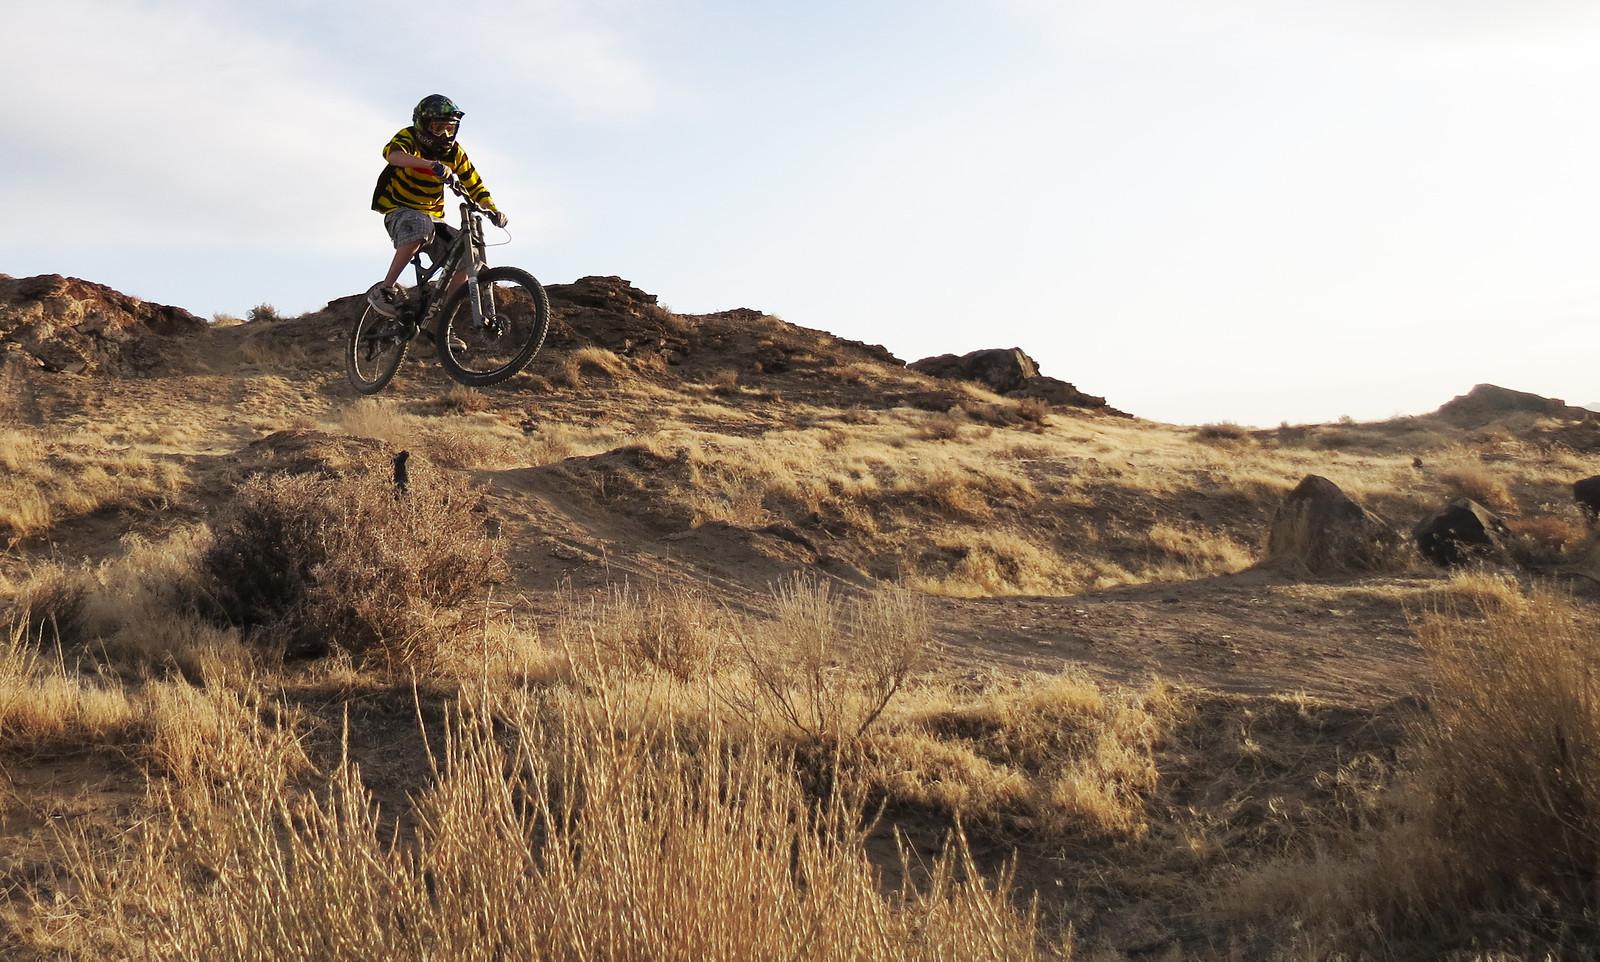 Scrub 2 - Moosey - Mountain Biking Pictures - Vital MTB